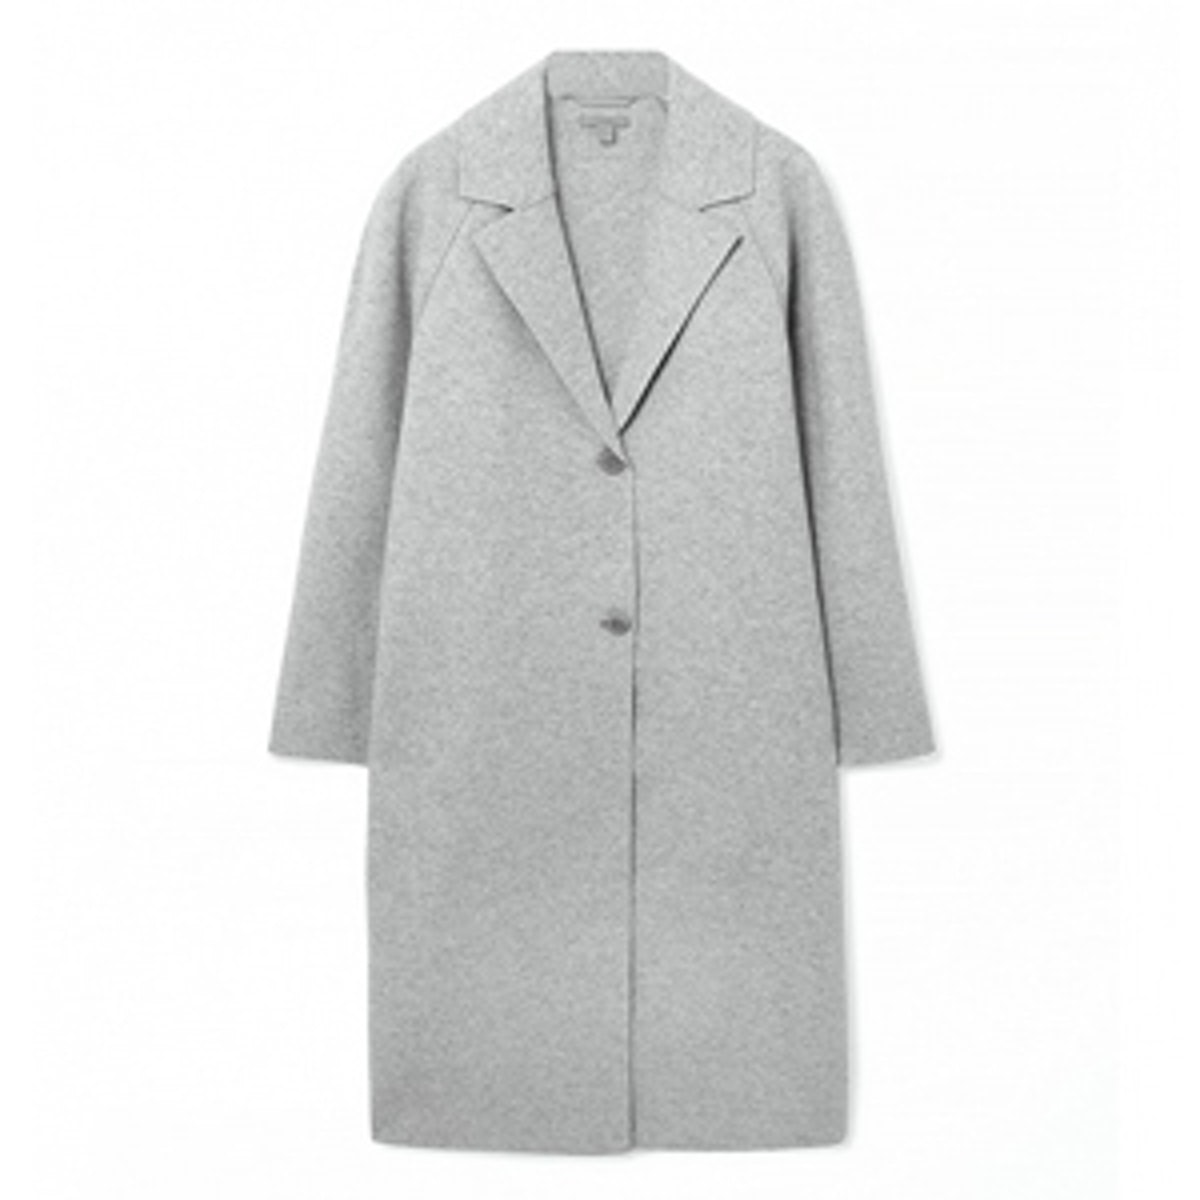 Clean Edge Wool Coat